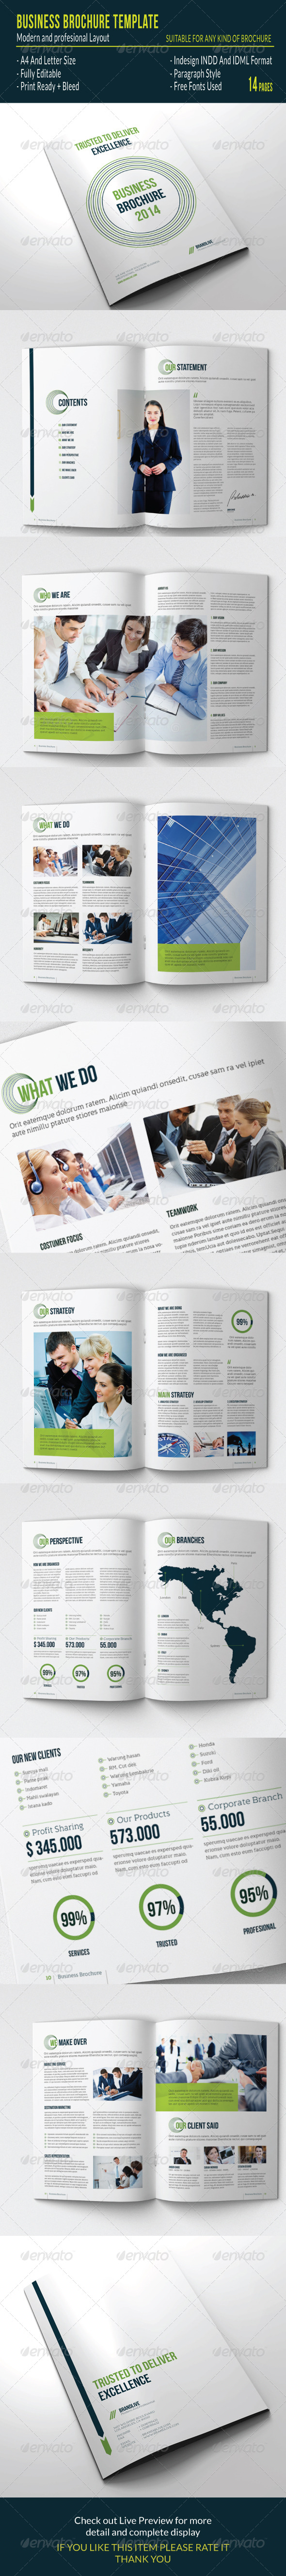 Business Brochure Template - Brochures Print Templates